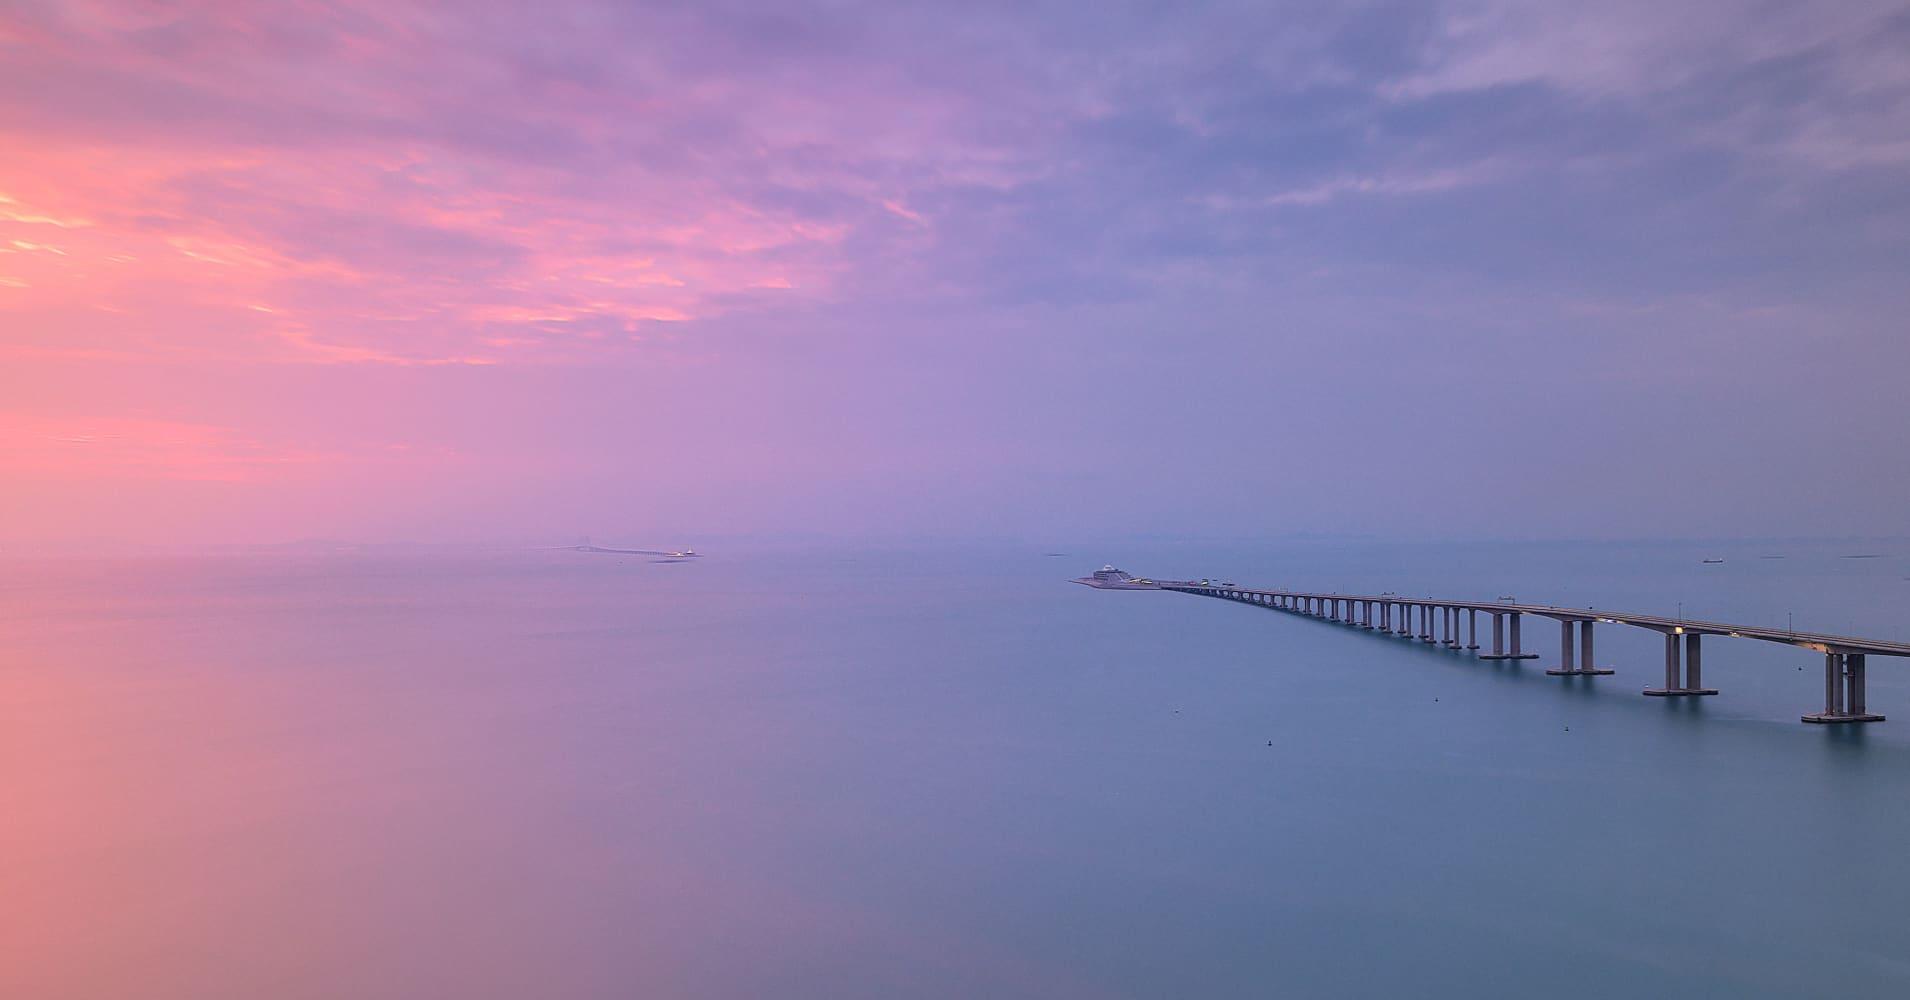 China's Xi Jinping opens world's longest bridge-cum-tunnel sea crossing